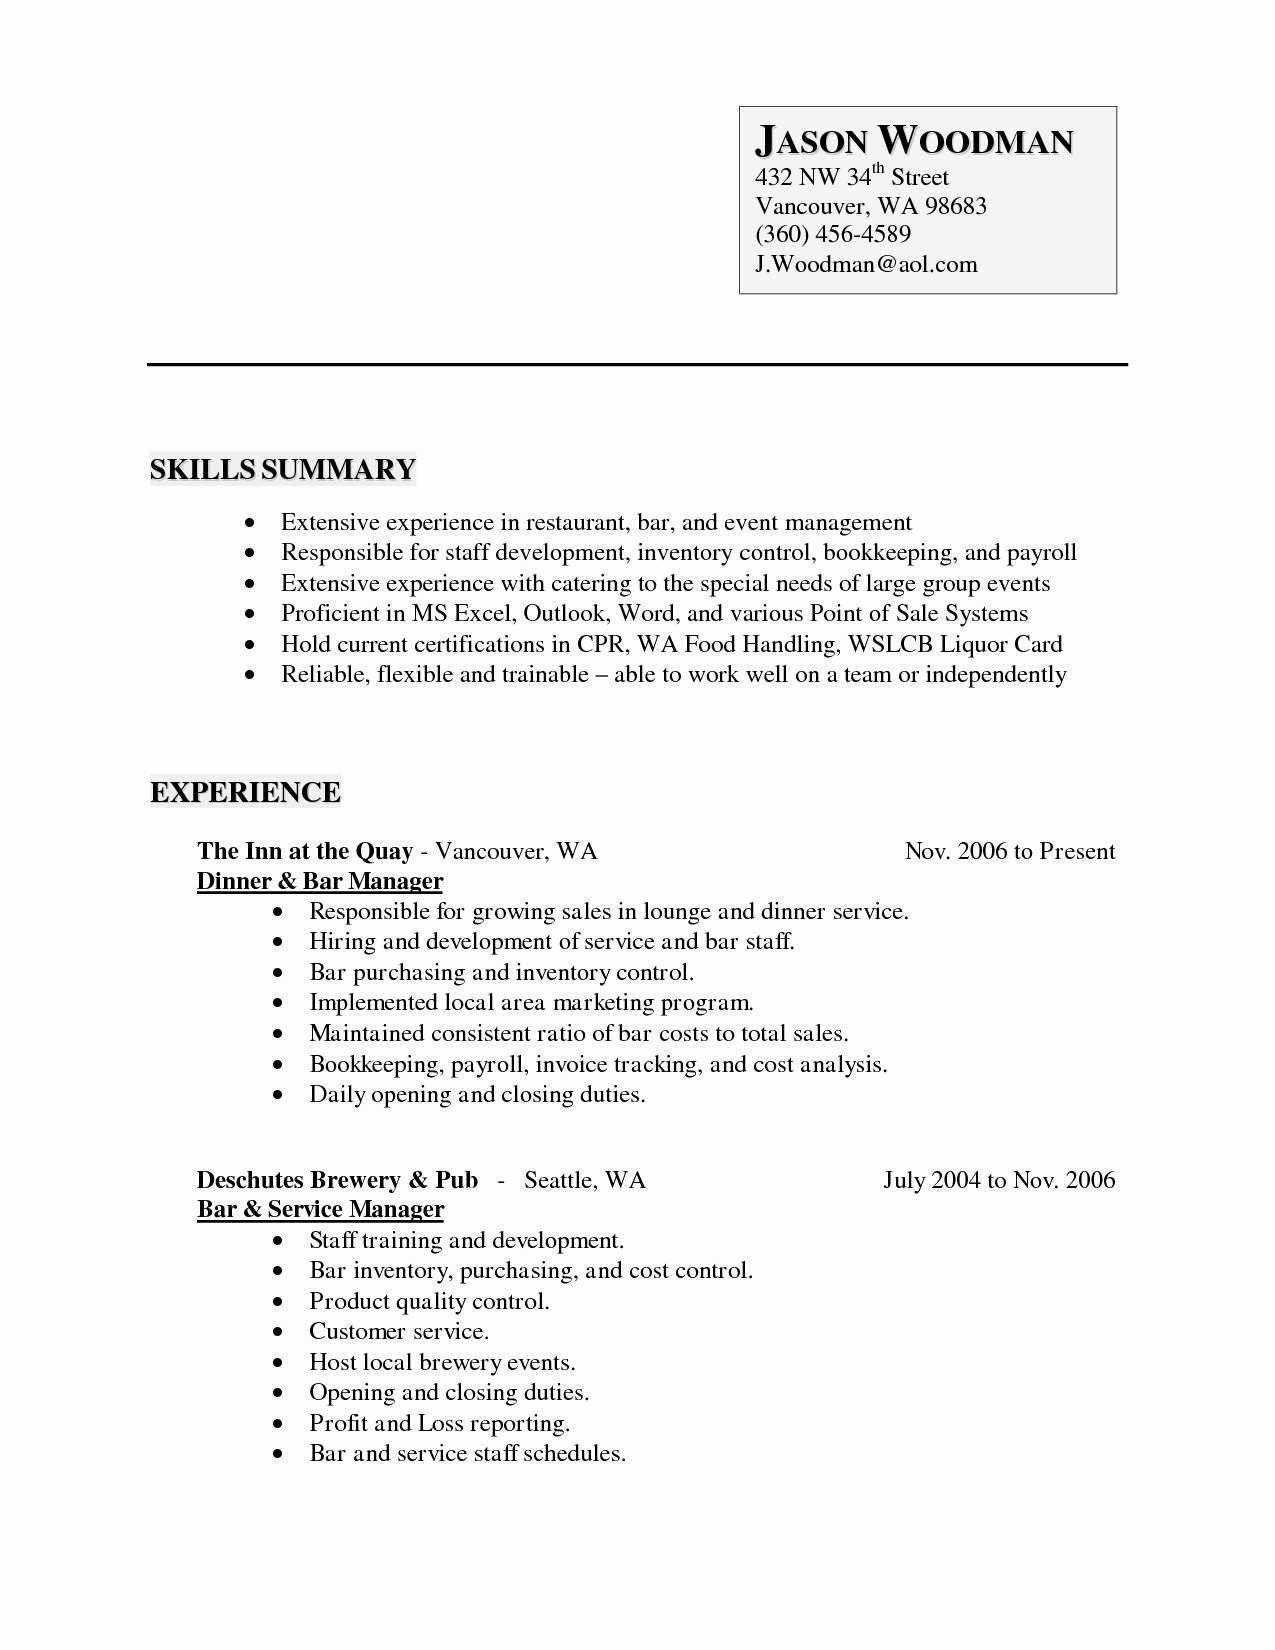 Verb Worksheets 3rd Grade